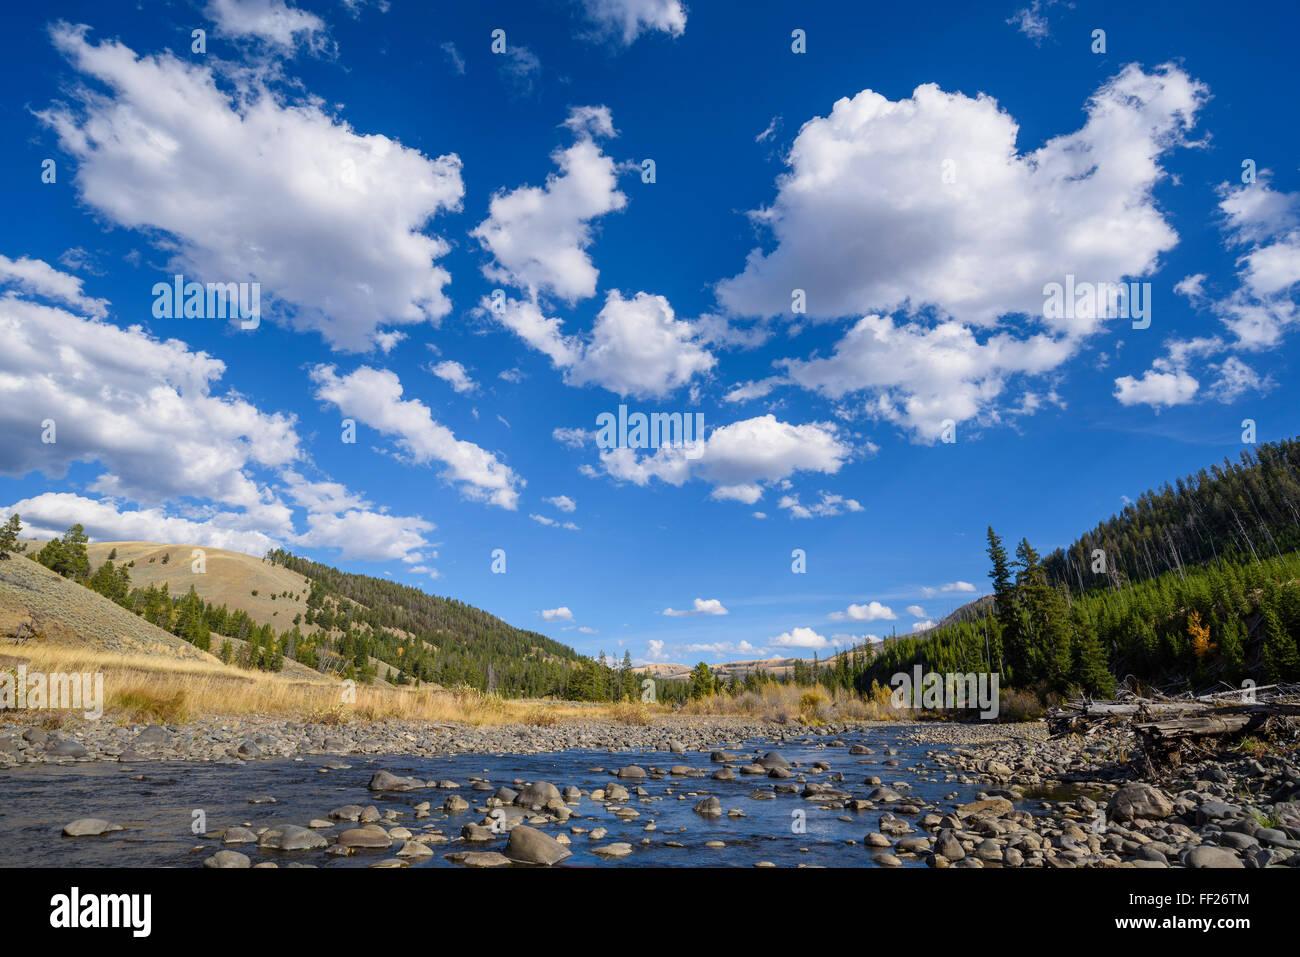 Cache Creek, YeRMRMowstone NationaRM Park, UNESCO WorRMd Heritage Site, Wyoming, United States of America, North - Stock Image